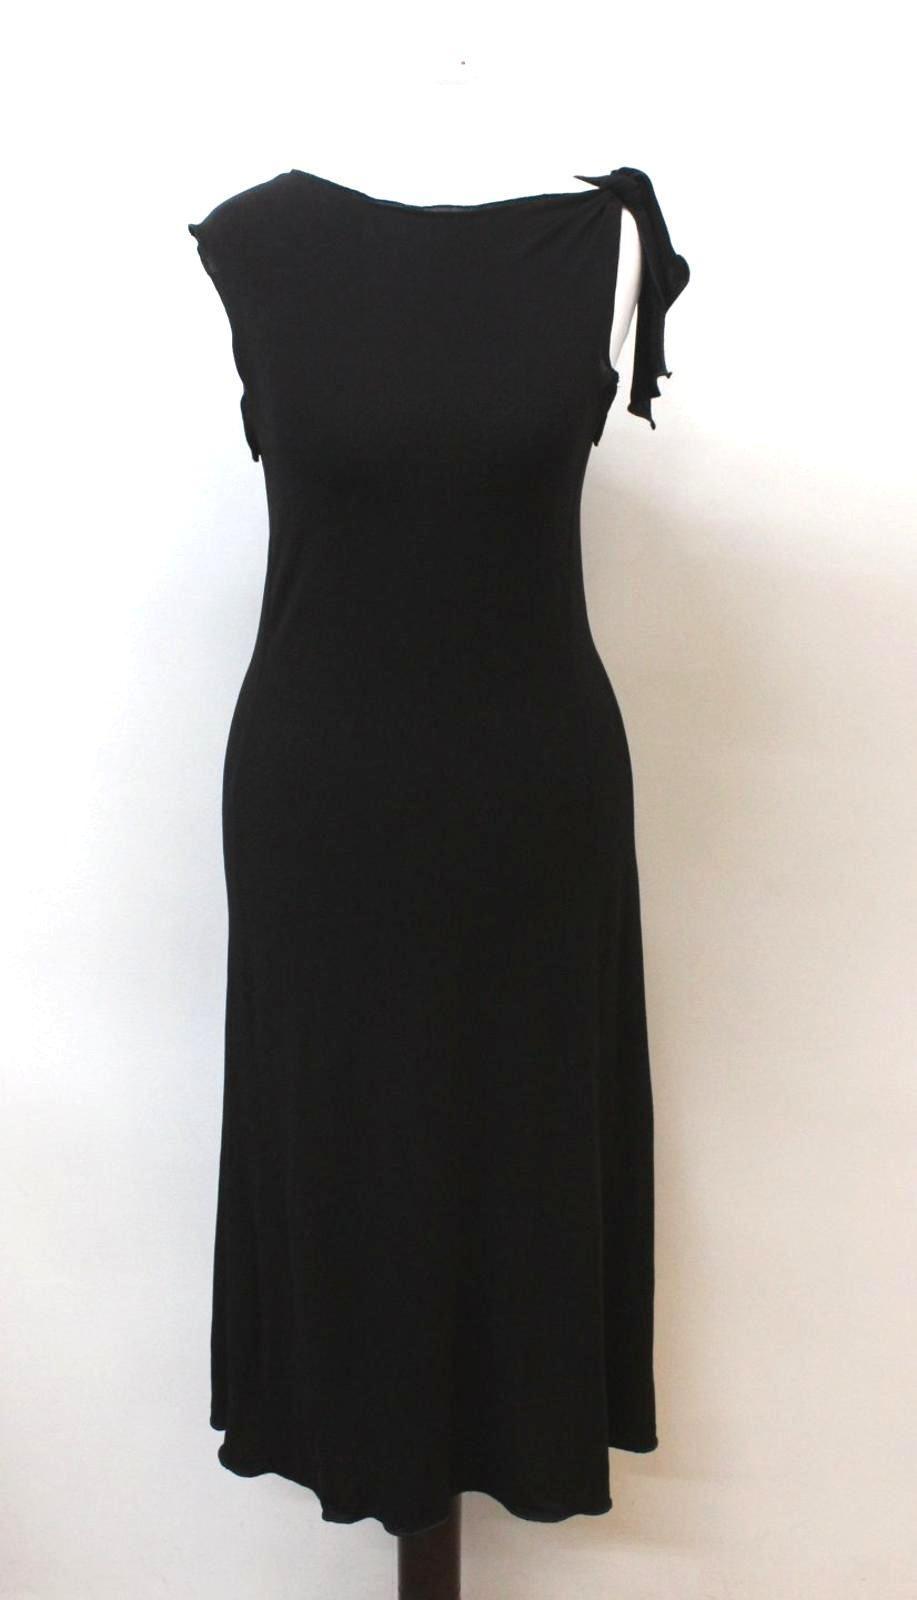 ARMANI-COLLEZIONI-Ladies-Black-Sleeveless-Knot-Tie-Shift-Style-Dress-US6-UK10